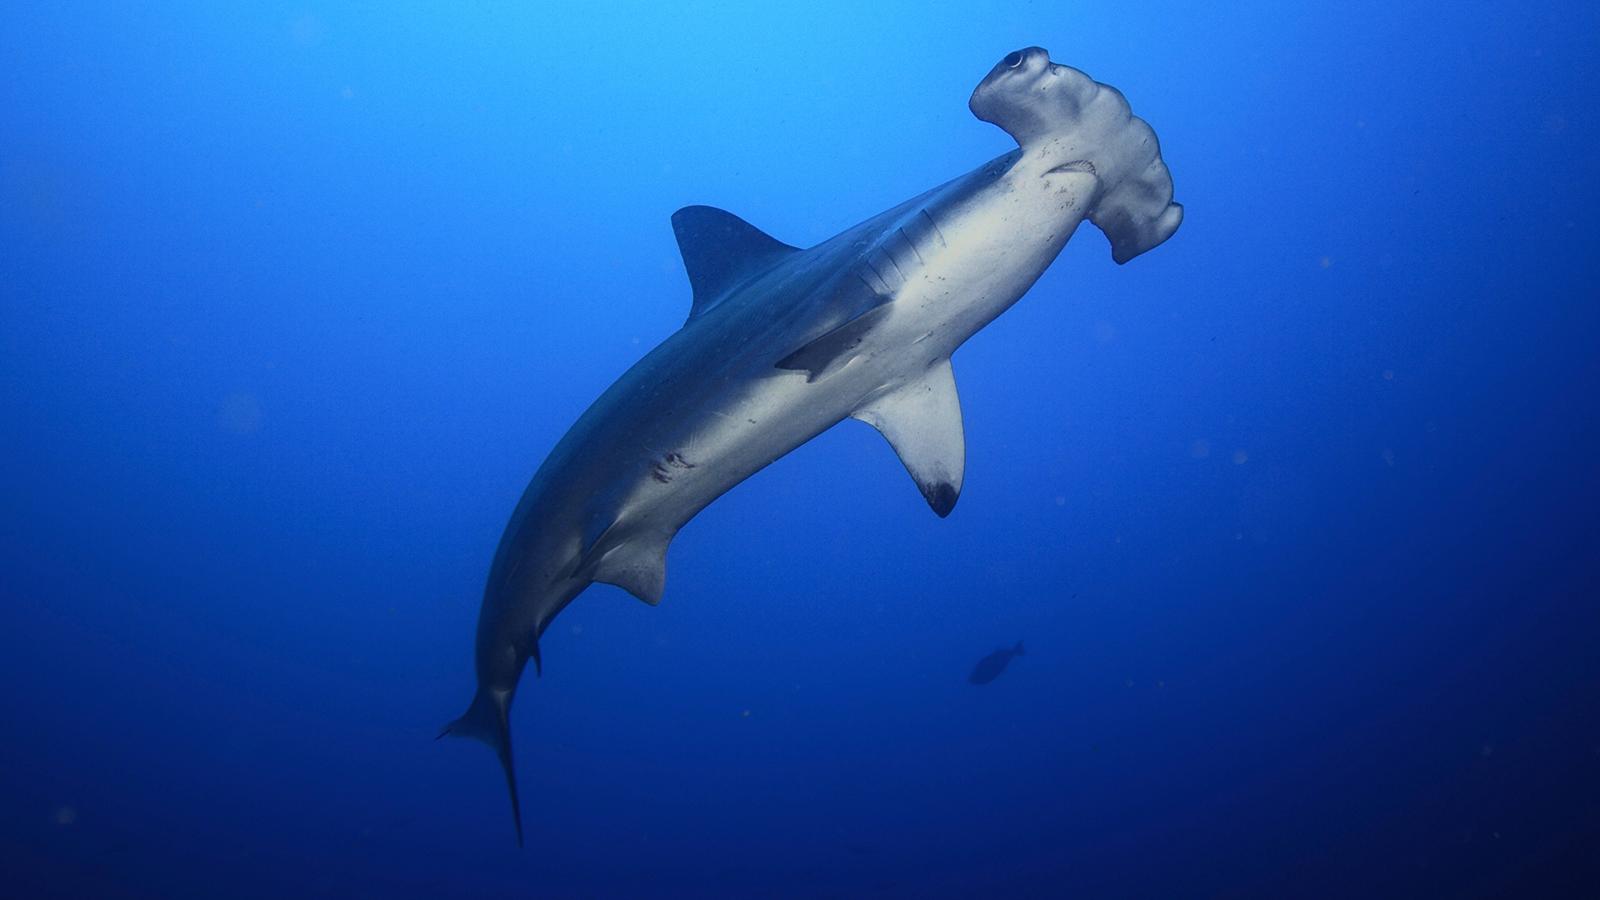 Costa Rica Prepares To Export 10 Tons Of Hammerhead Shark